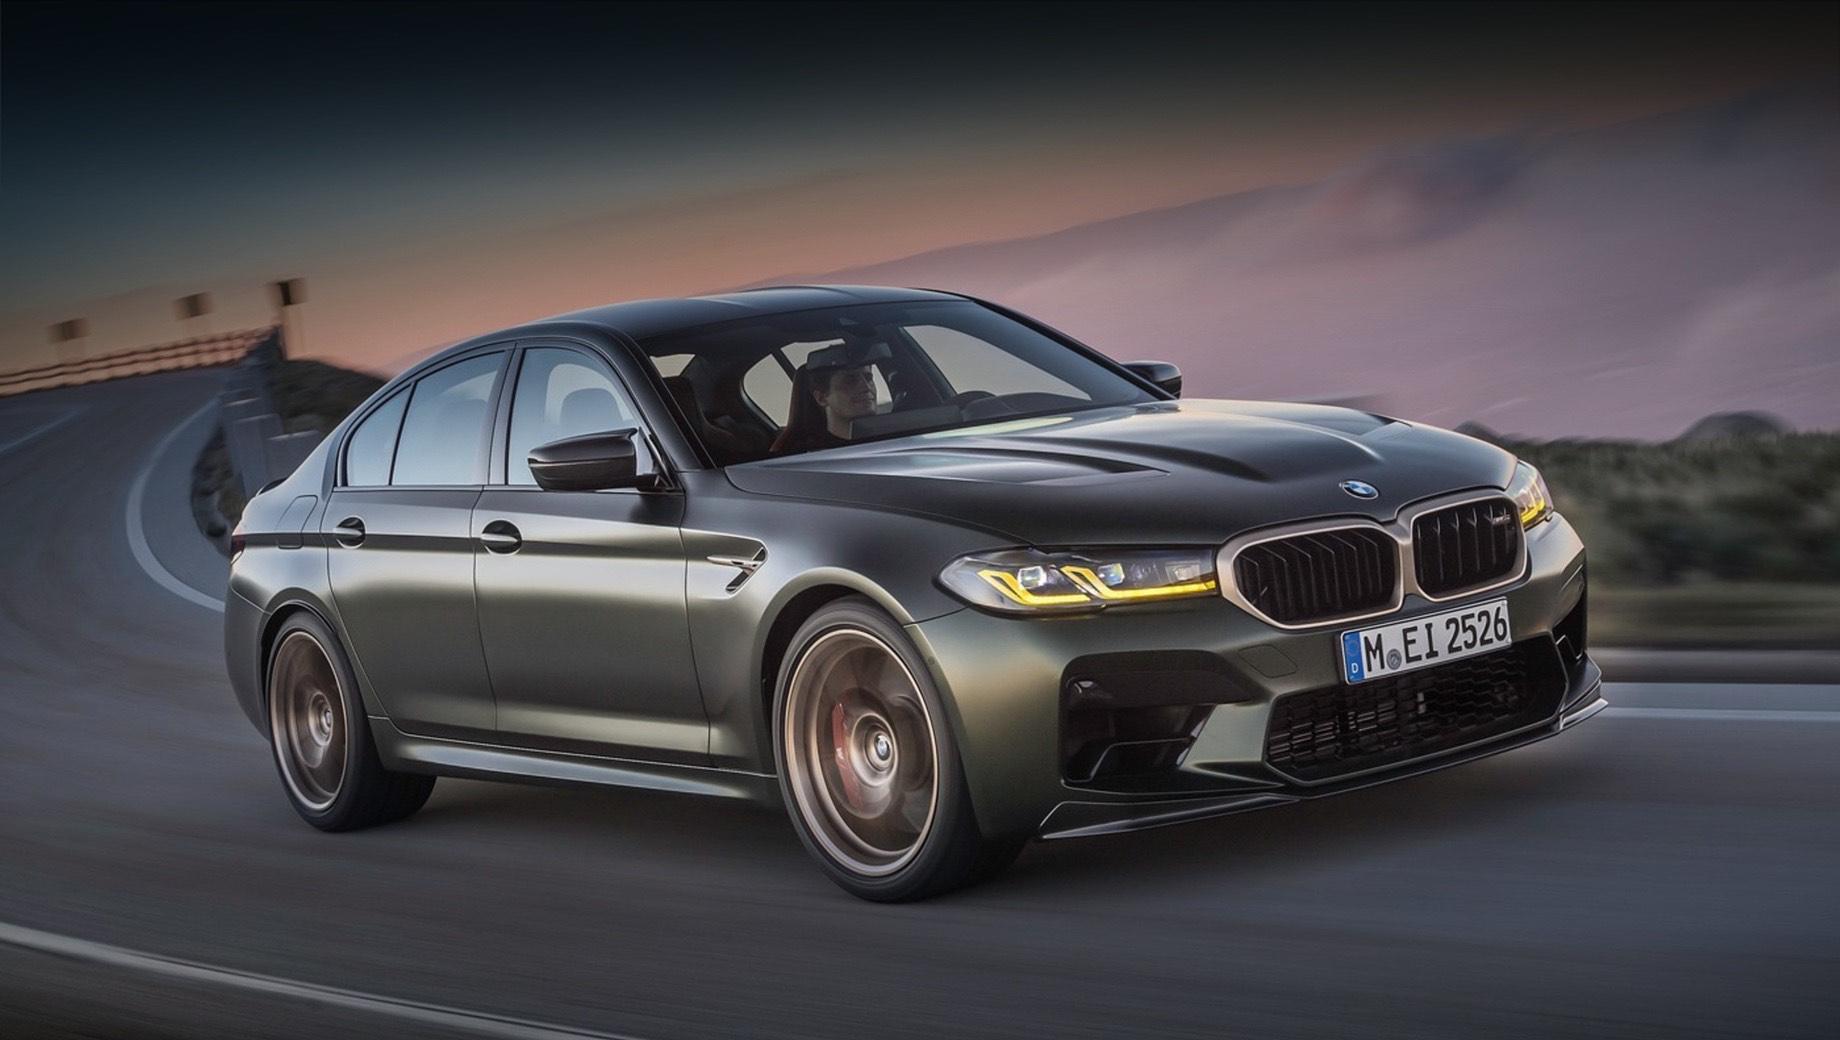 Седан BMW M5 предложил суперкаровскую динамику